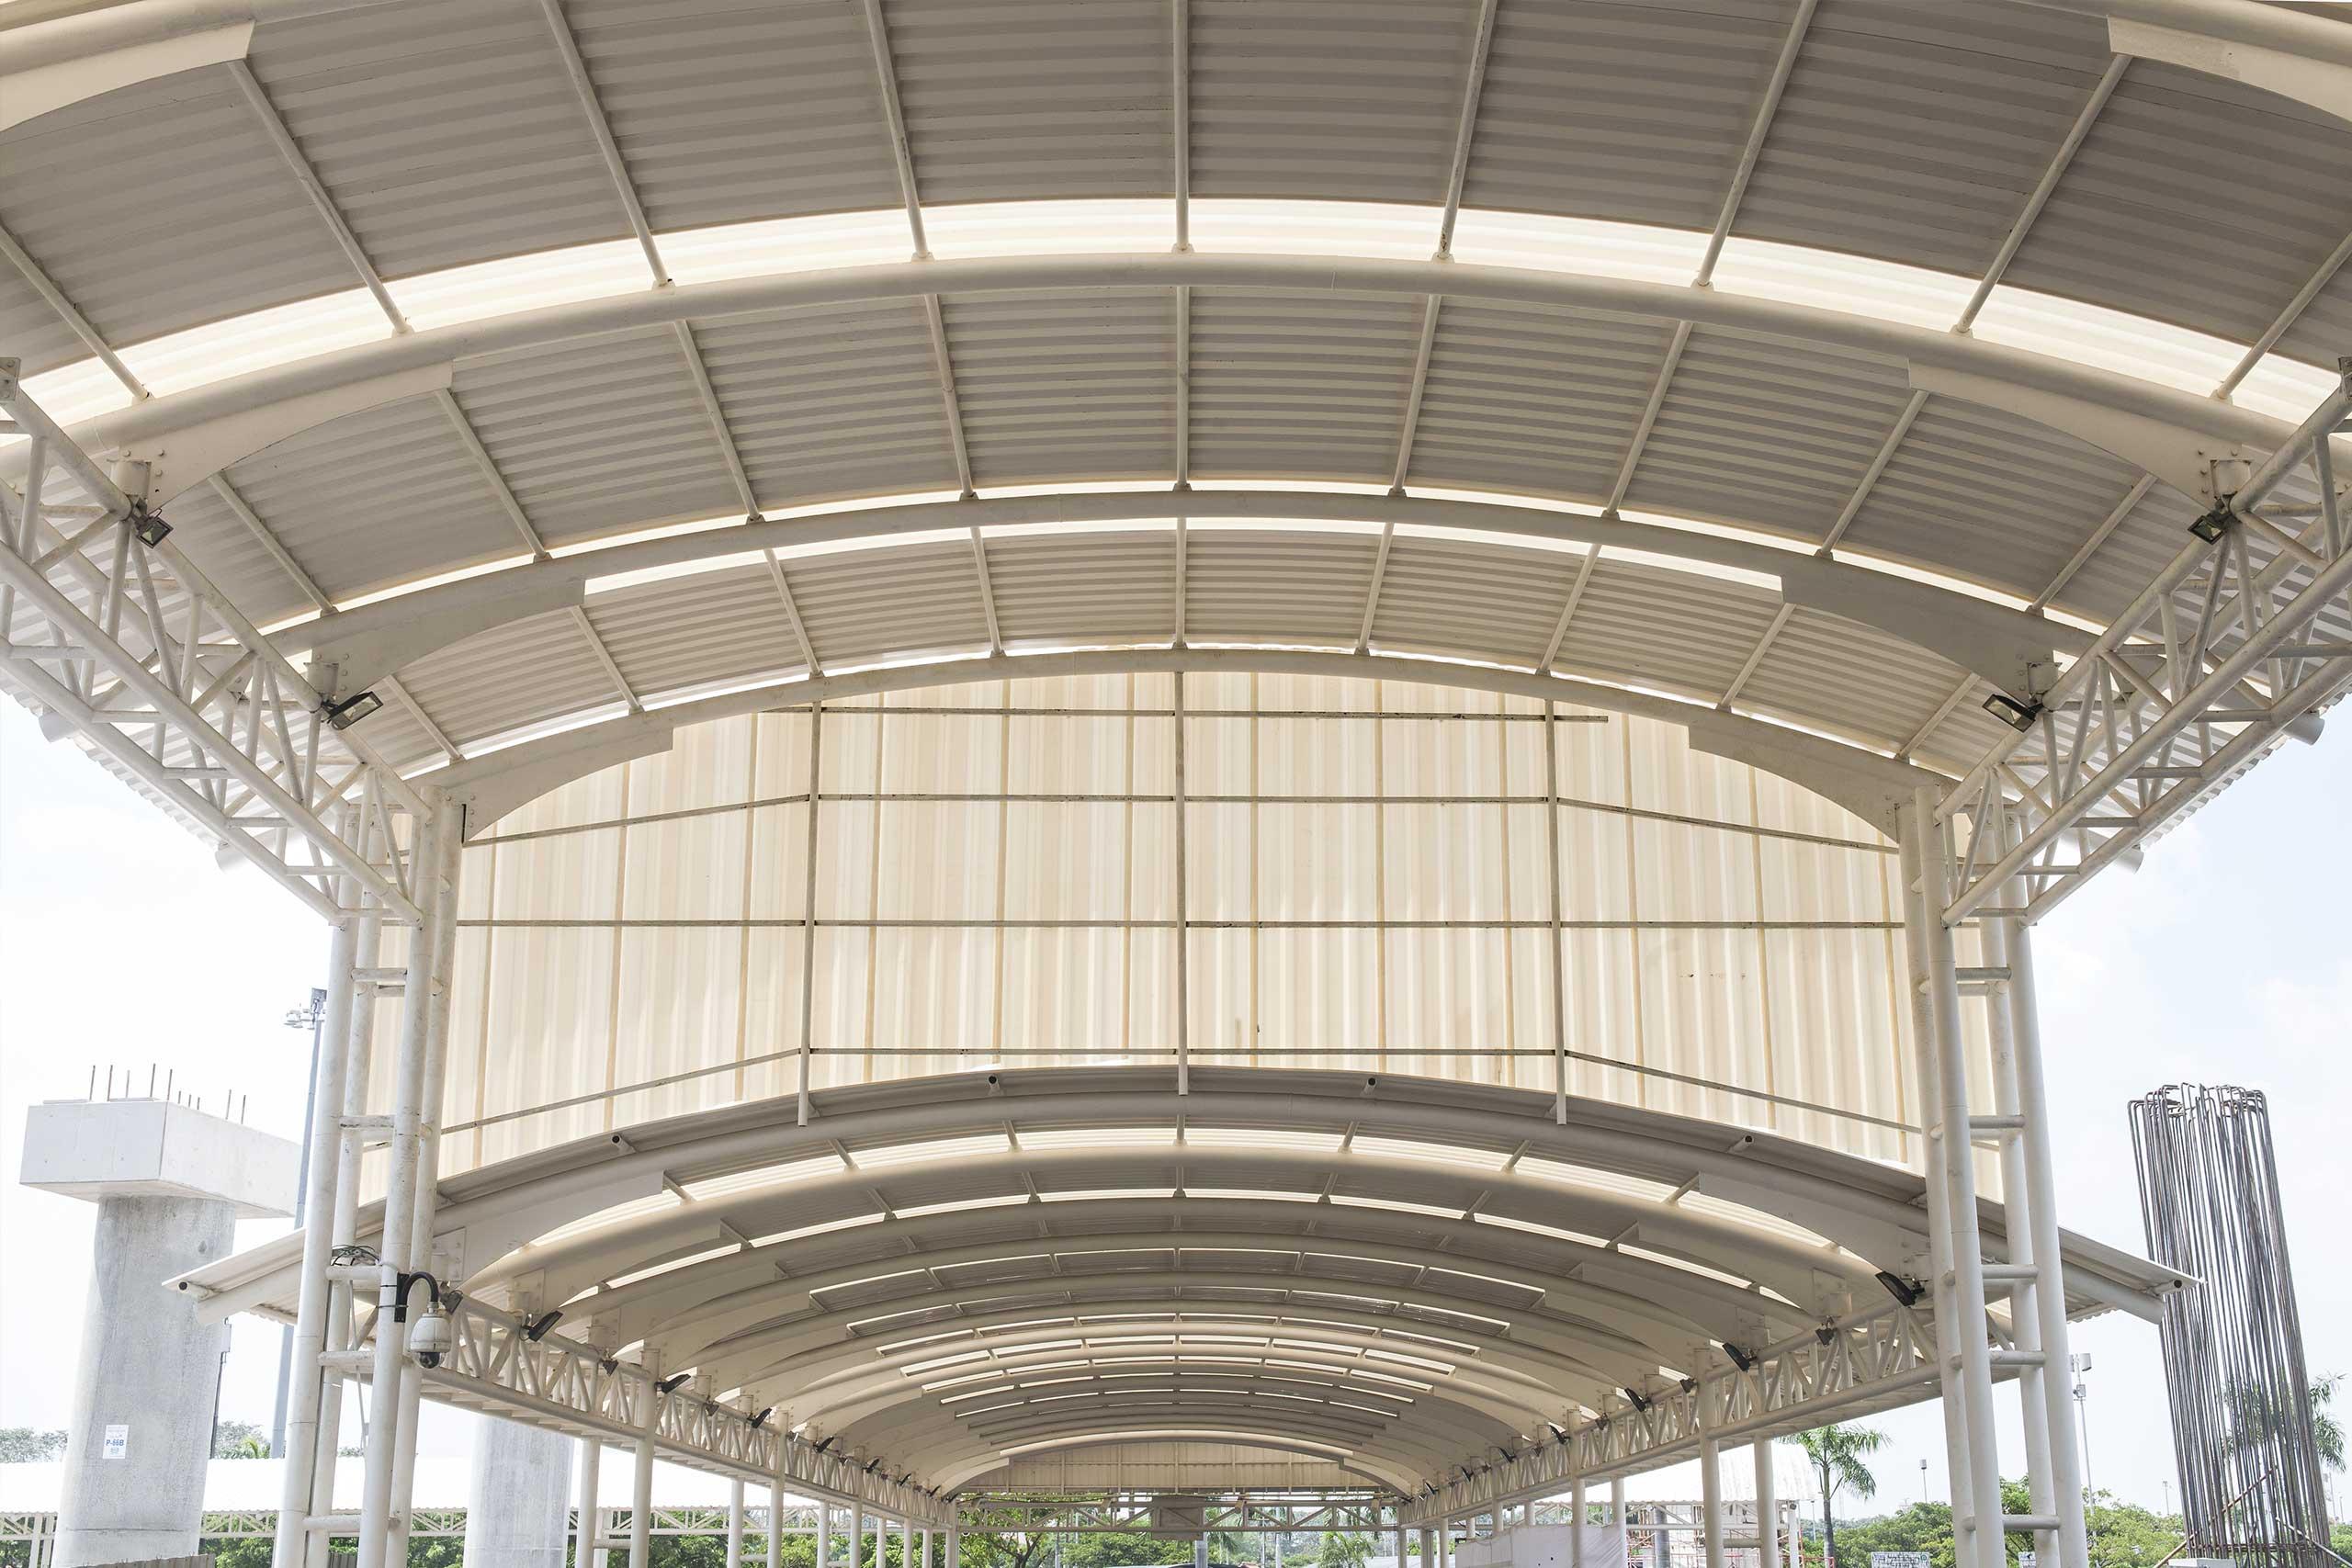 alderon kanopi atap upvc doff semi transparan bening terbaik